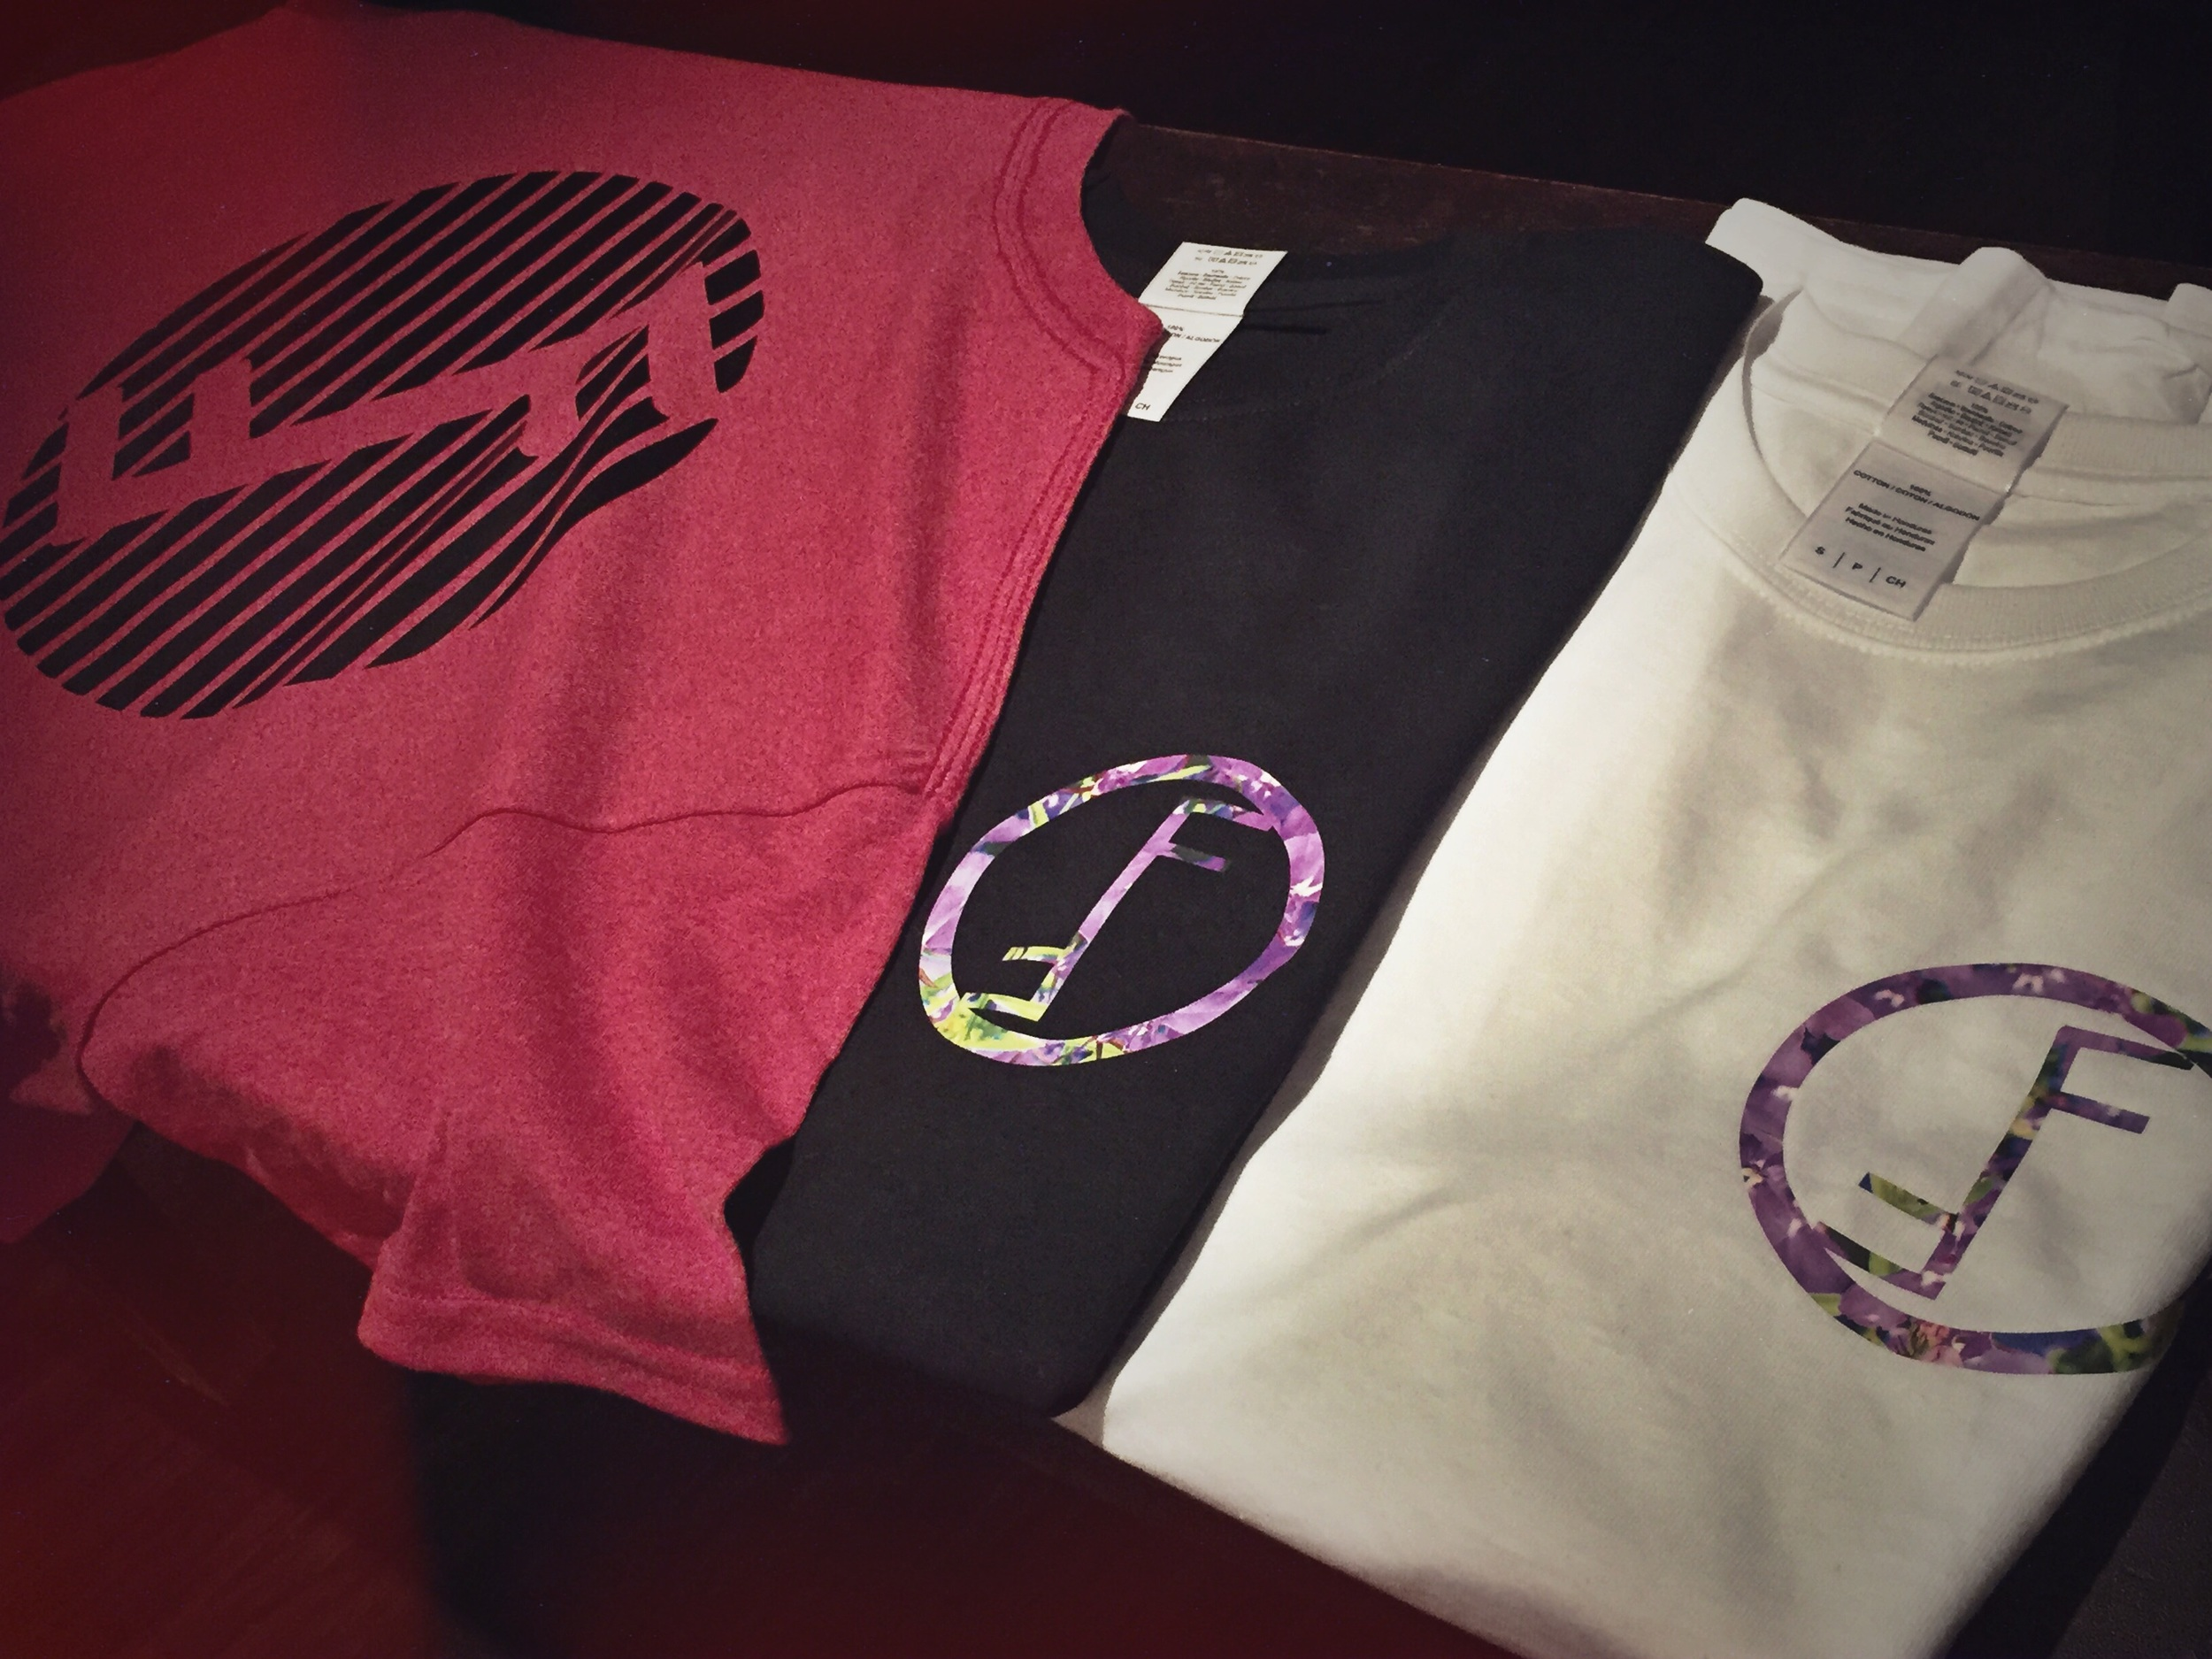 P.S. Here's a sneak peek of shirts coming soon